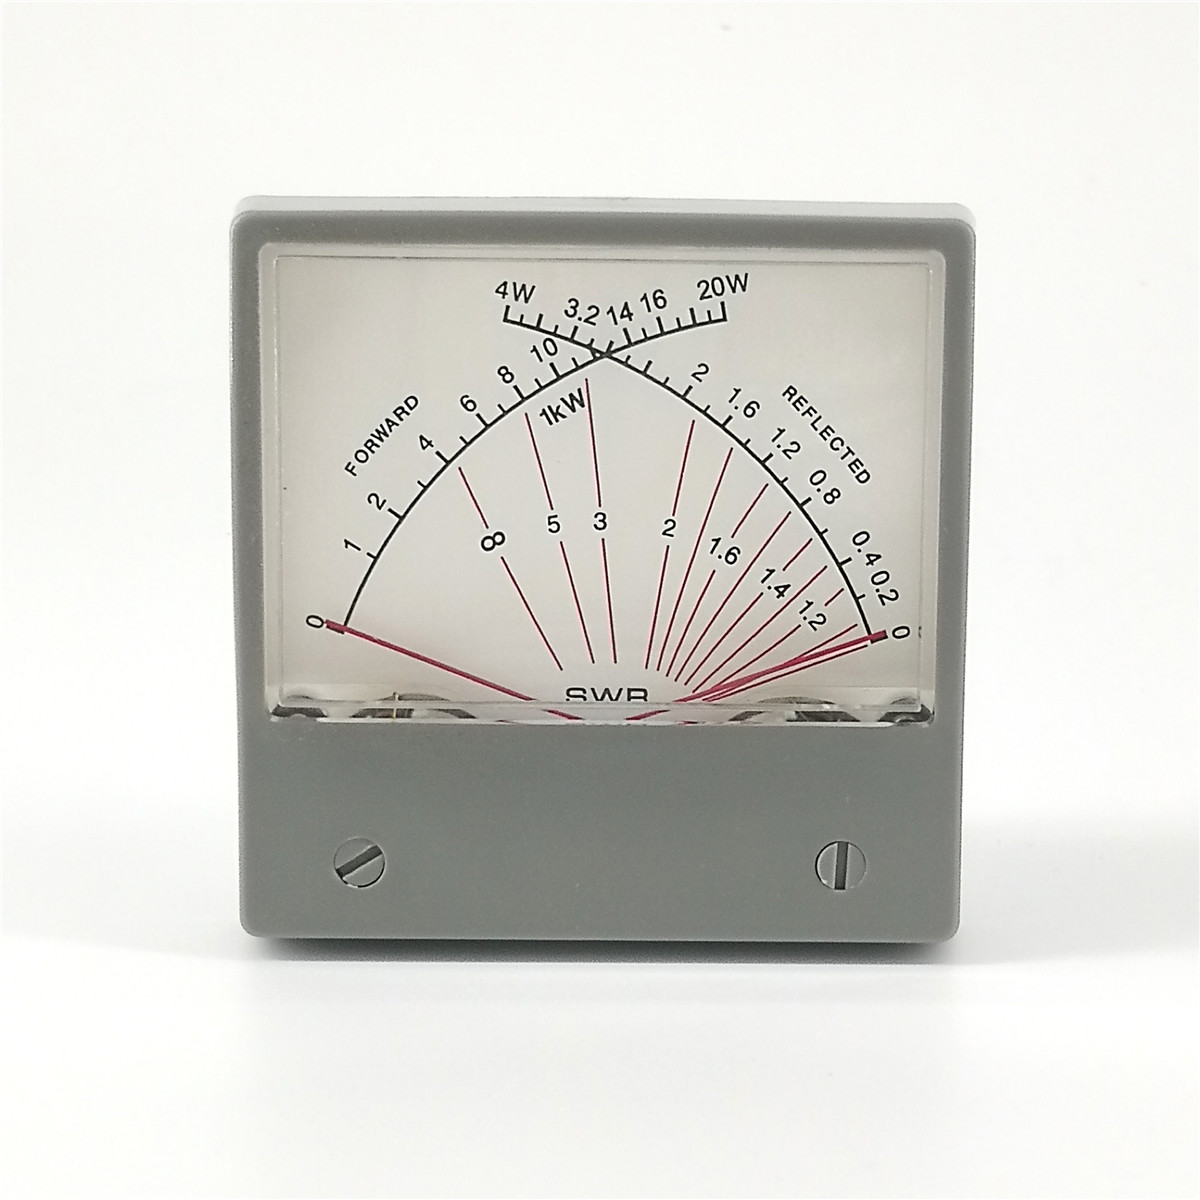 Stationary Wave Ratio SWR Meter Forwad 20W Reflected 4W 100uA Radio HF SWR Power Meter Dual Needles SZ-70-1